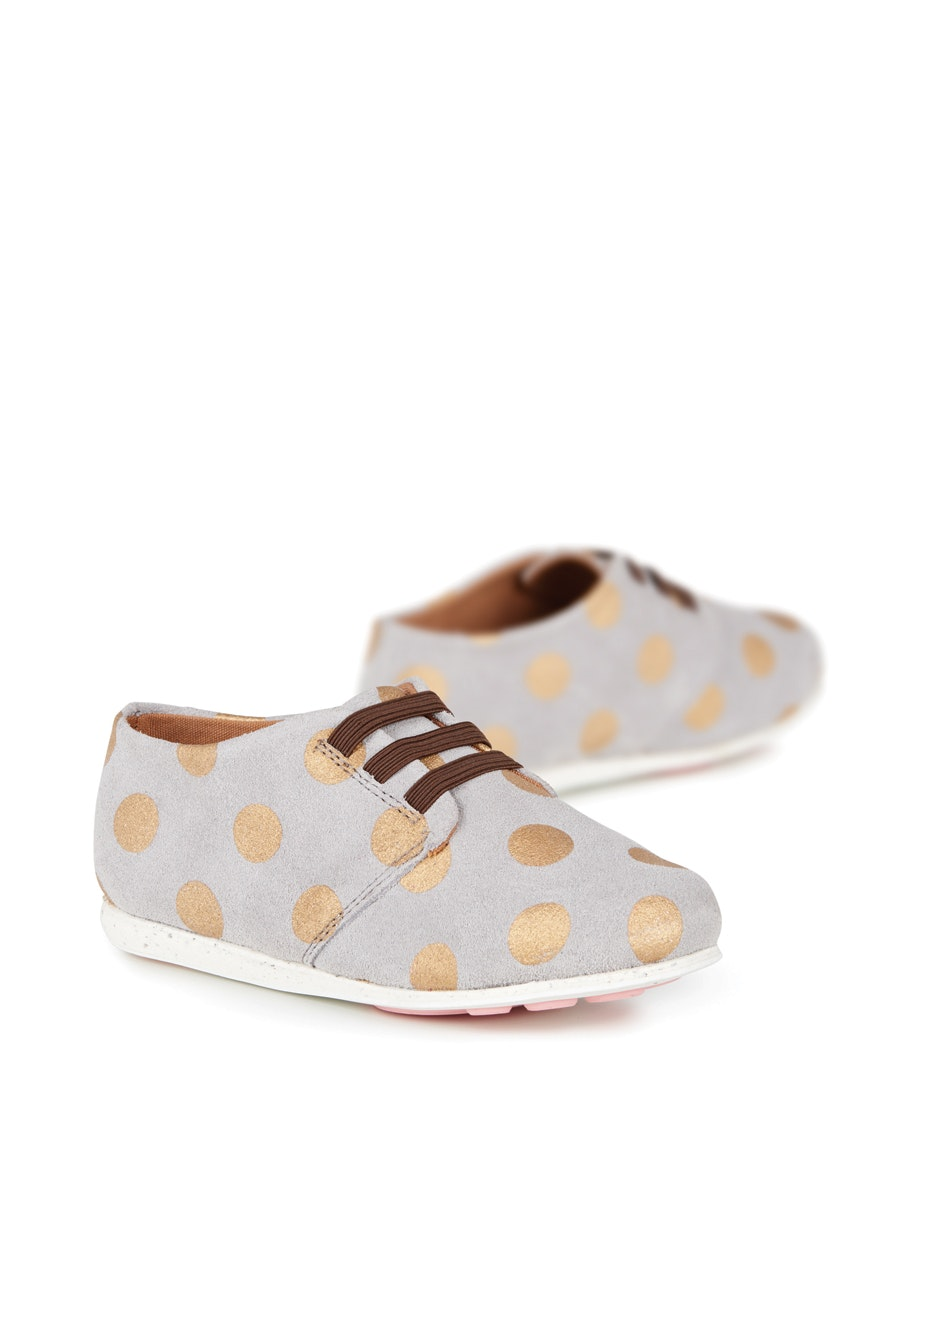 Emu - Spot Sneaker - Birch